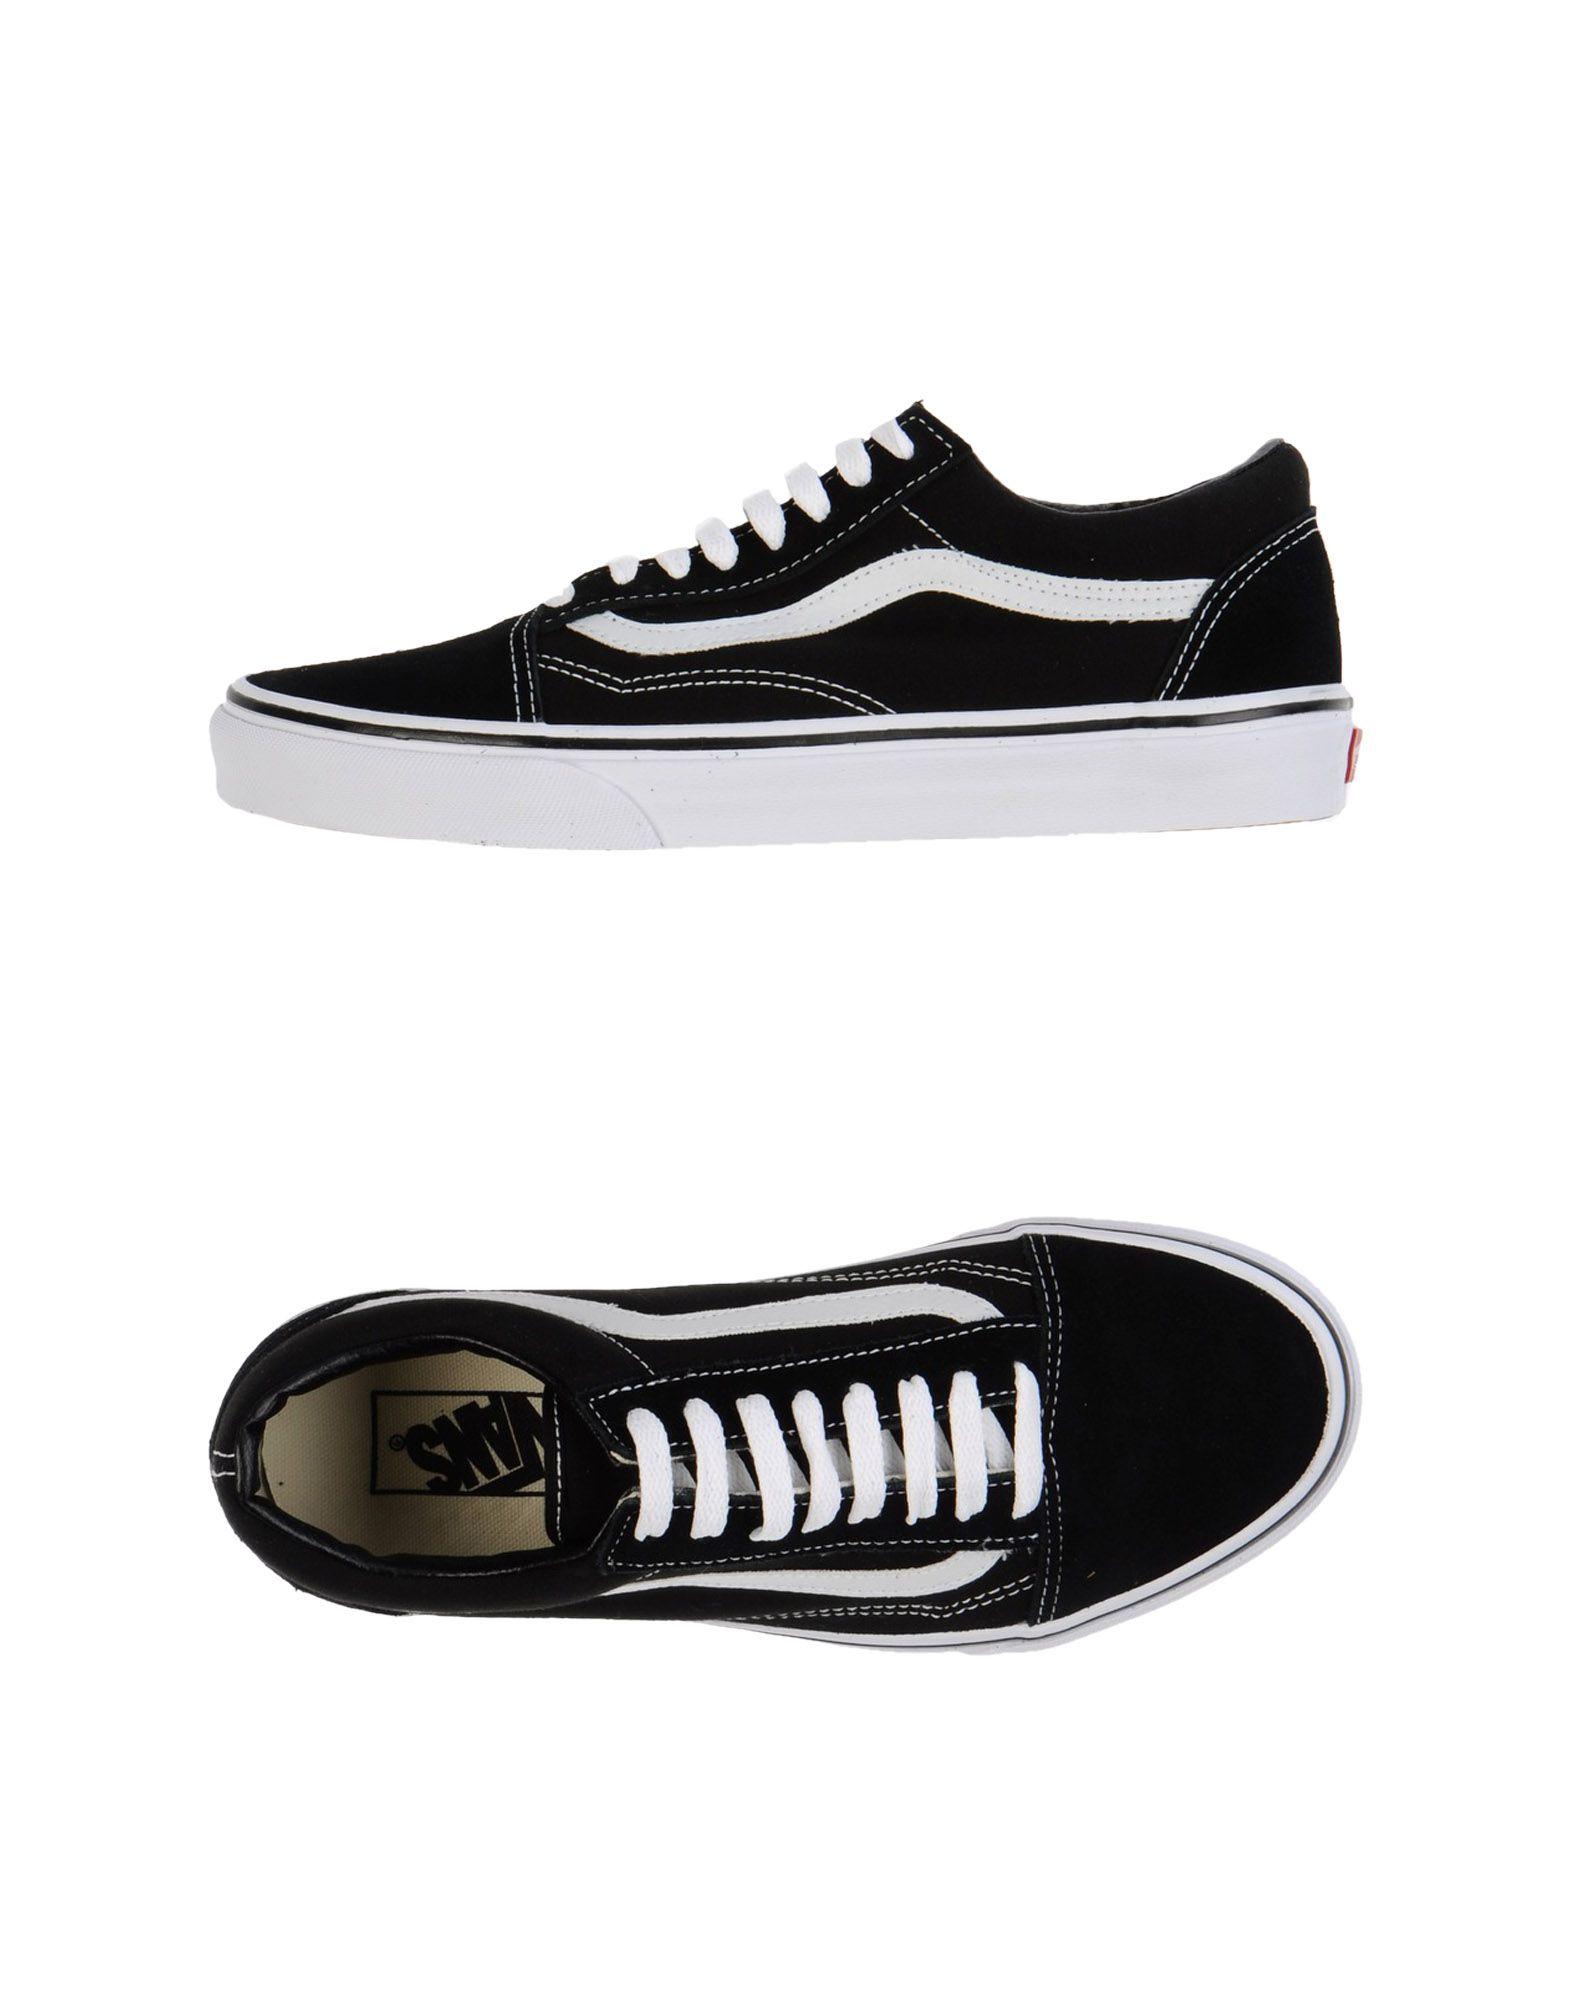 lyst vans low tops trainers in black for men. Black Bedroom Furniture Sets. Home Design Ideas